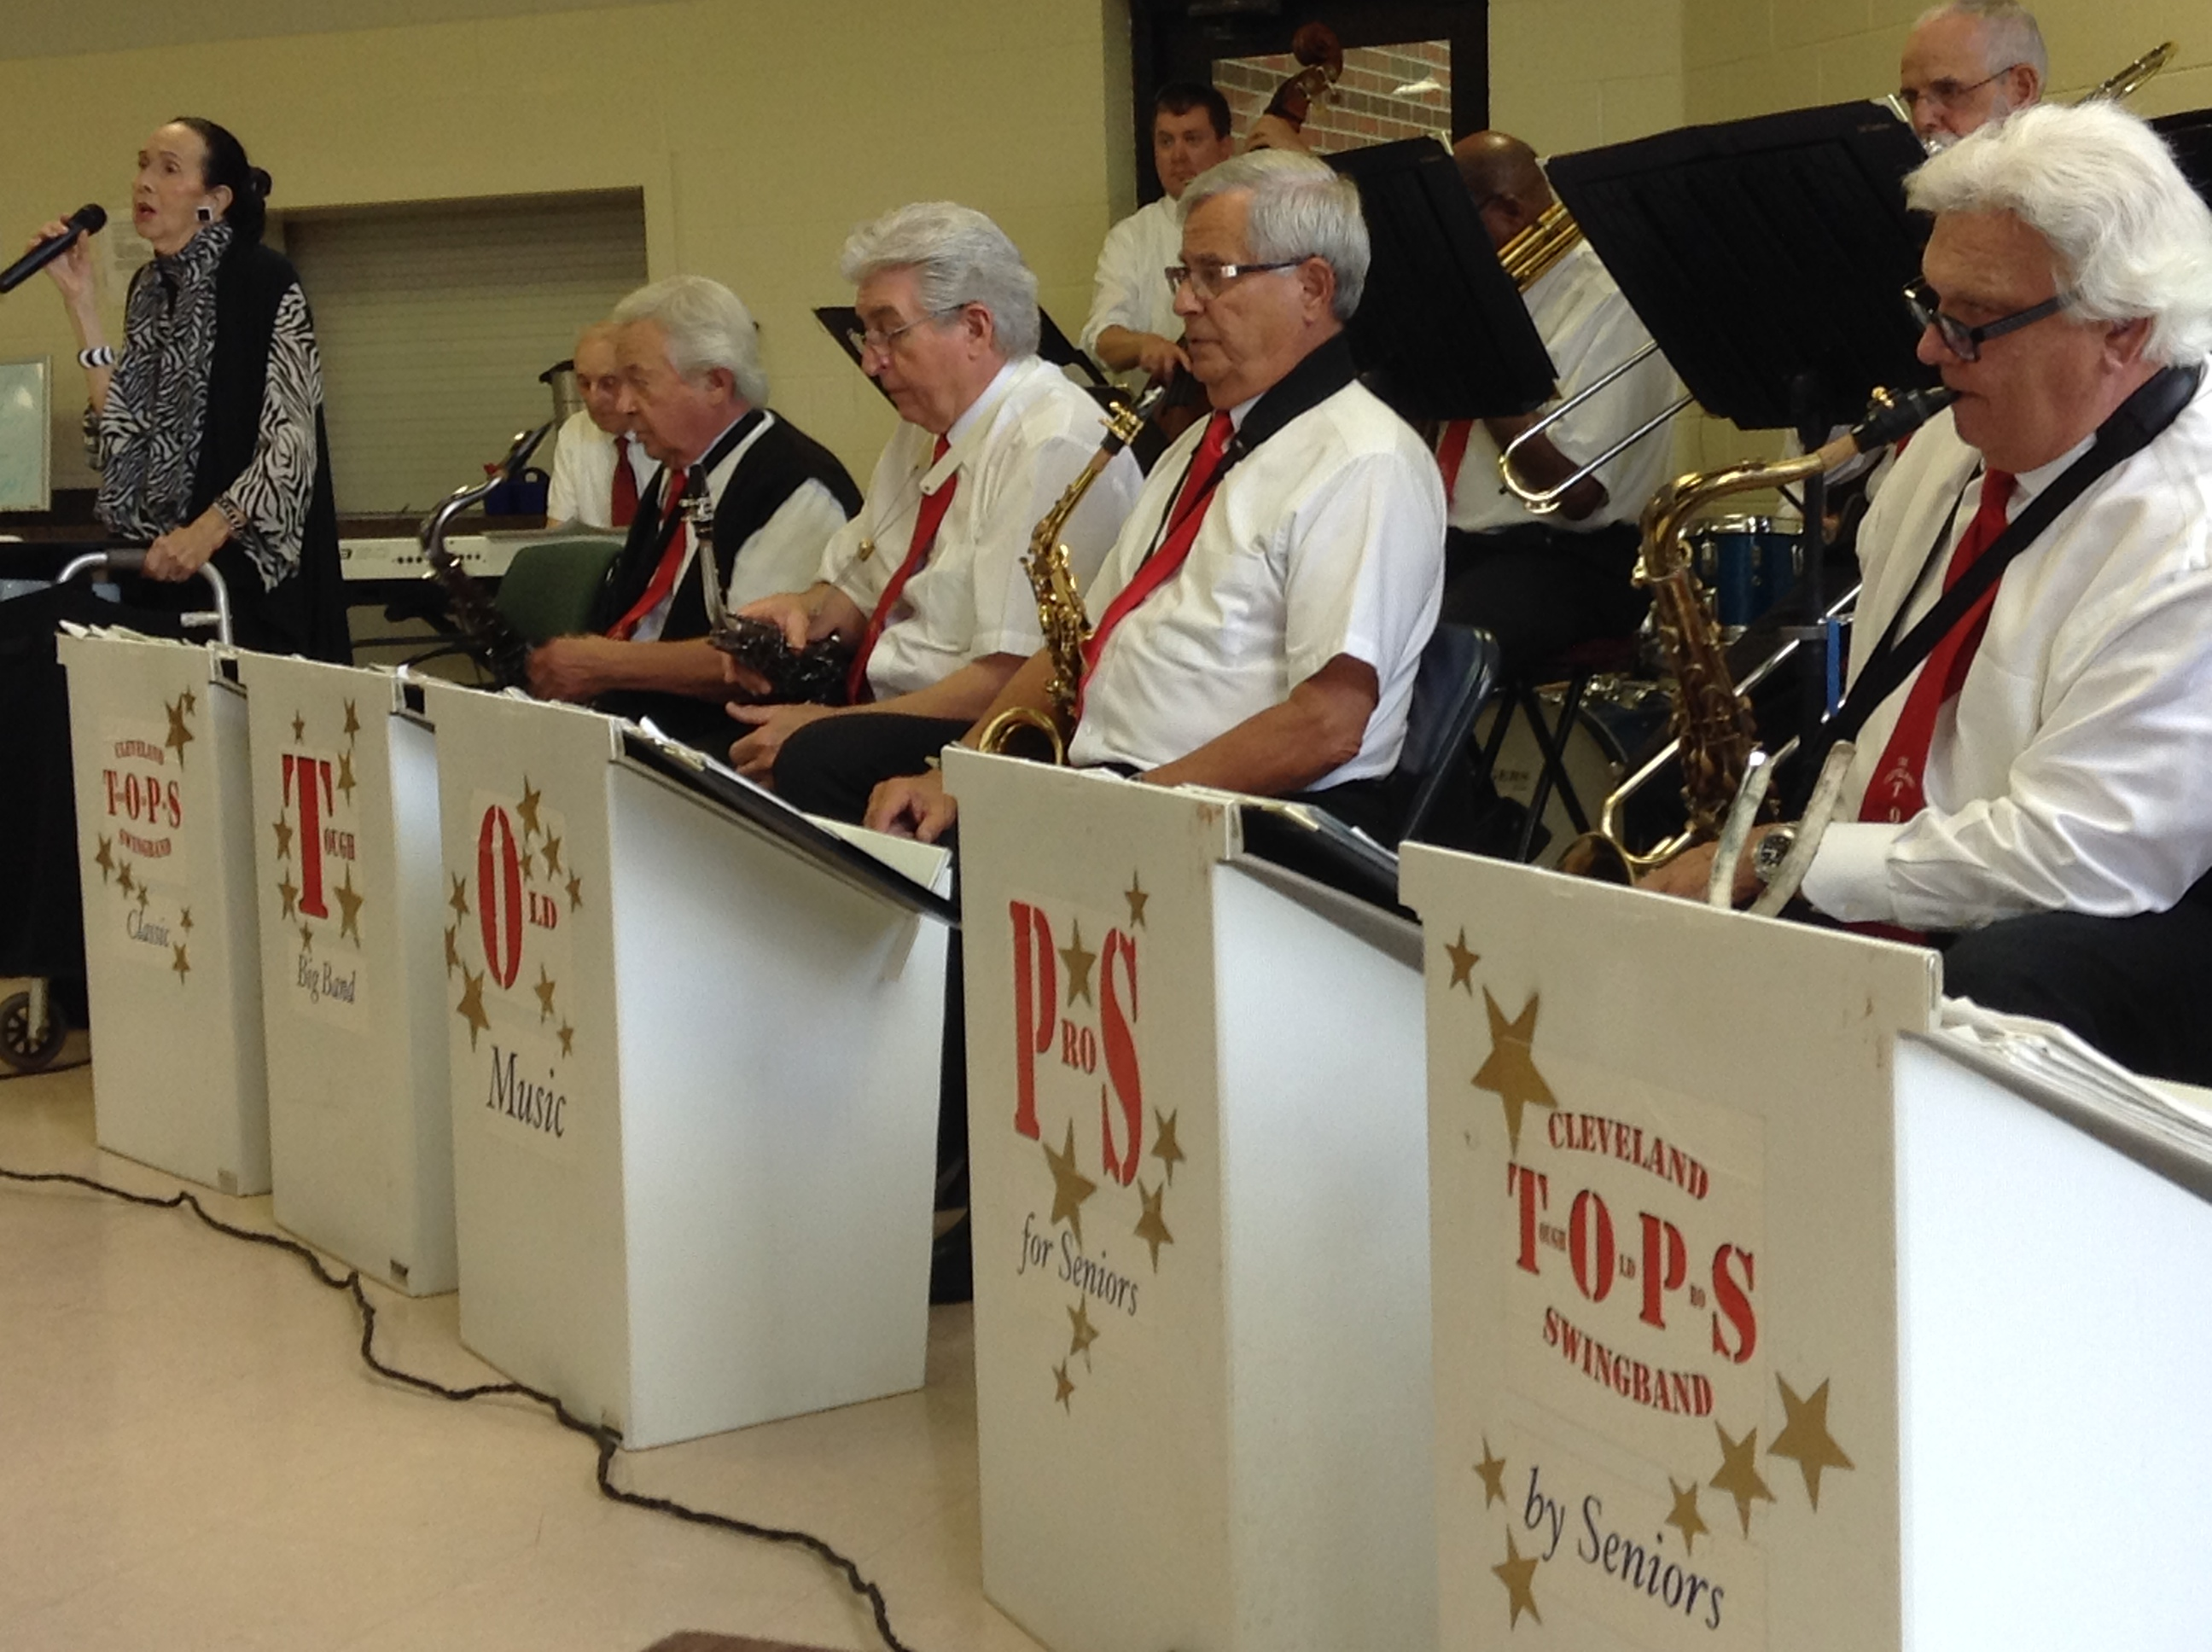 TOPS Jazz Band